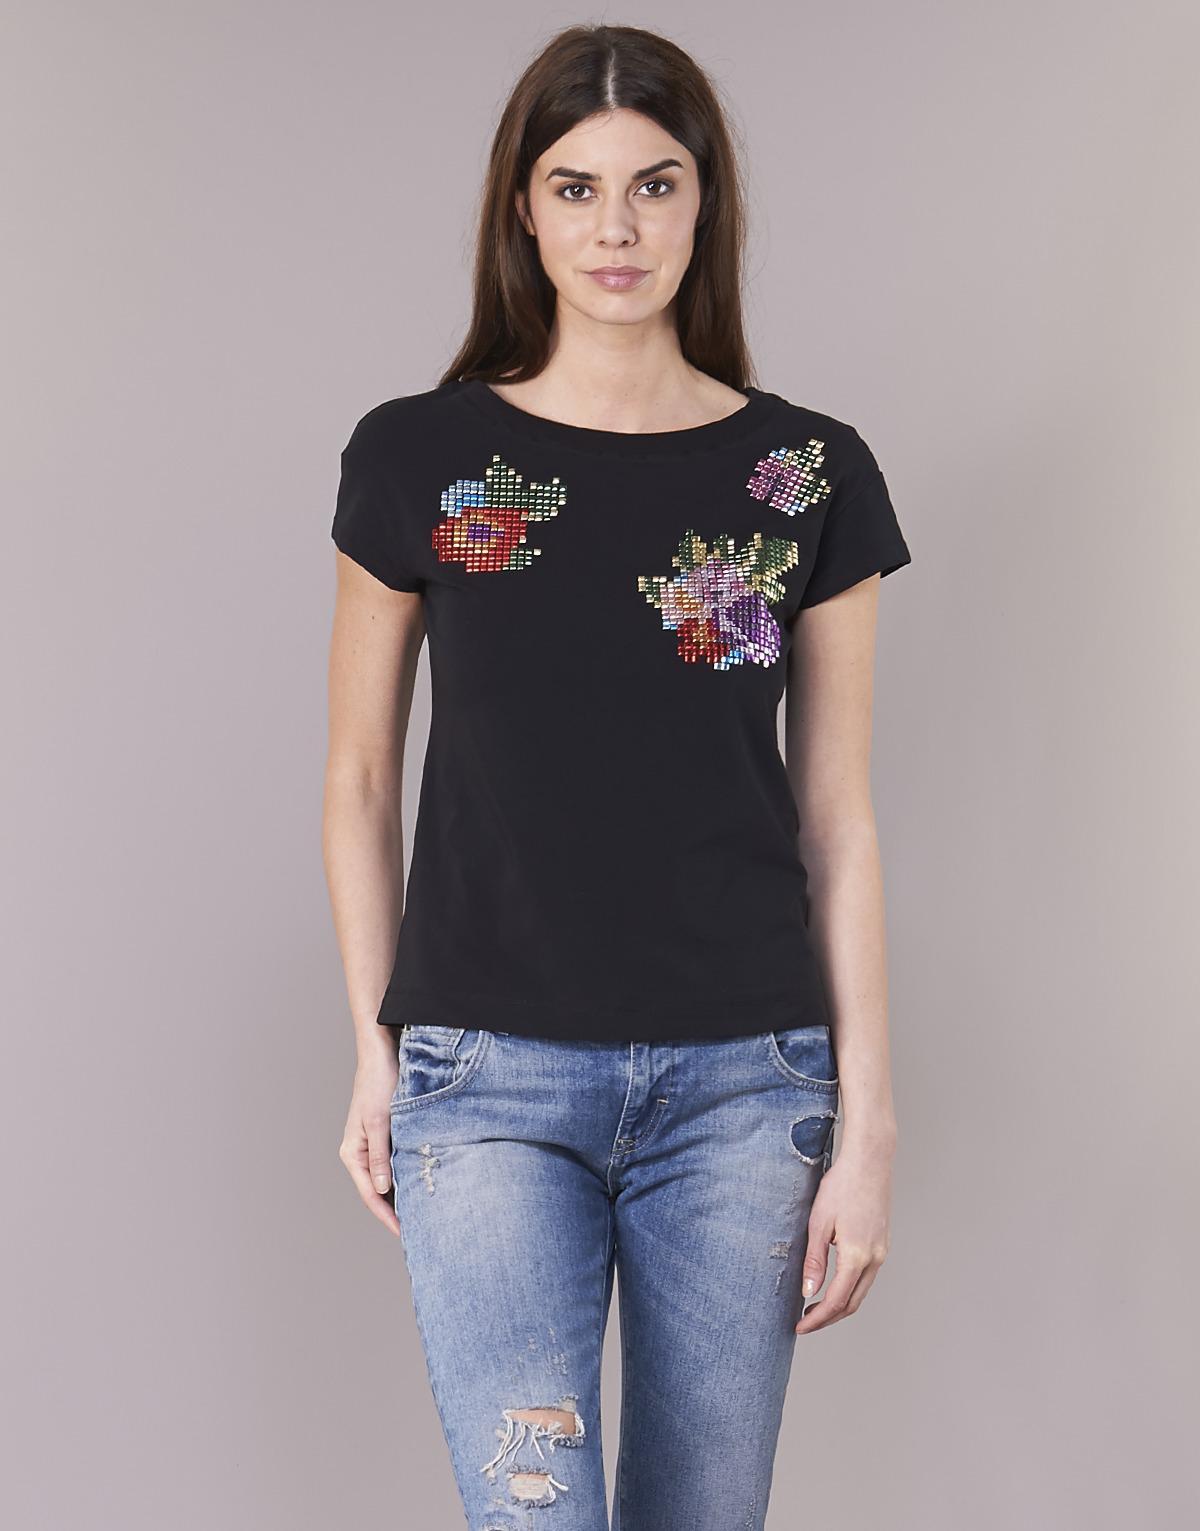 5f6a4fc3 Love Moschino W4f3051 Women's T Shirt In Black in Black - Lyst